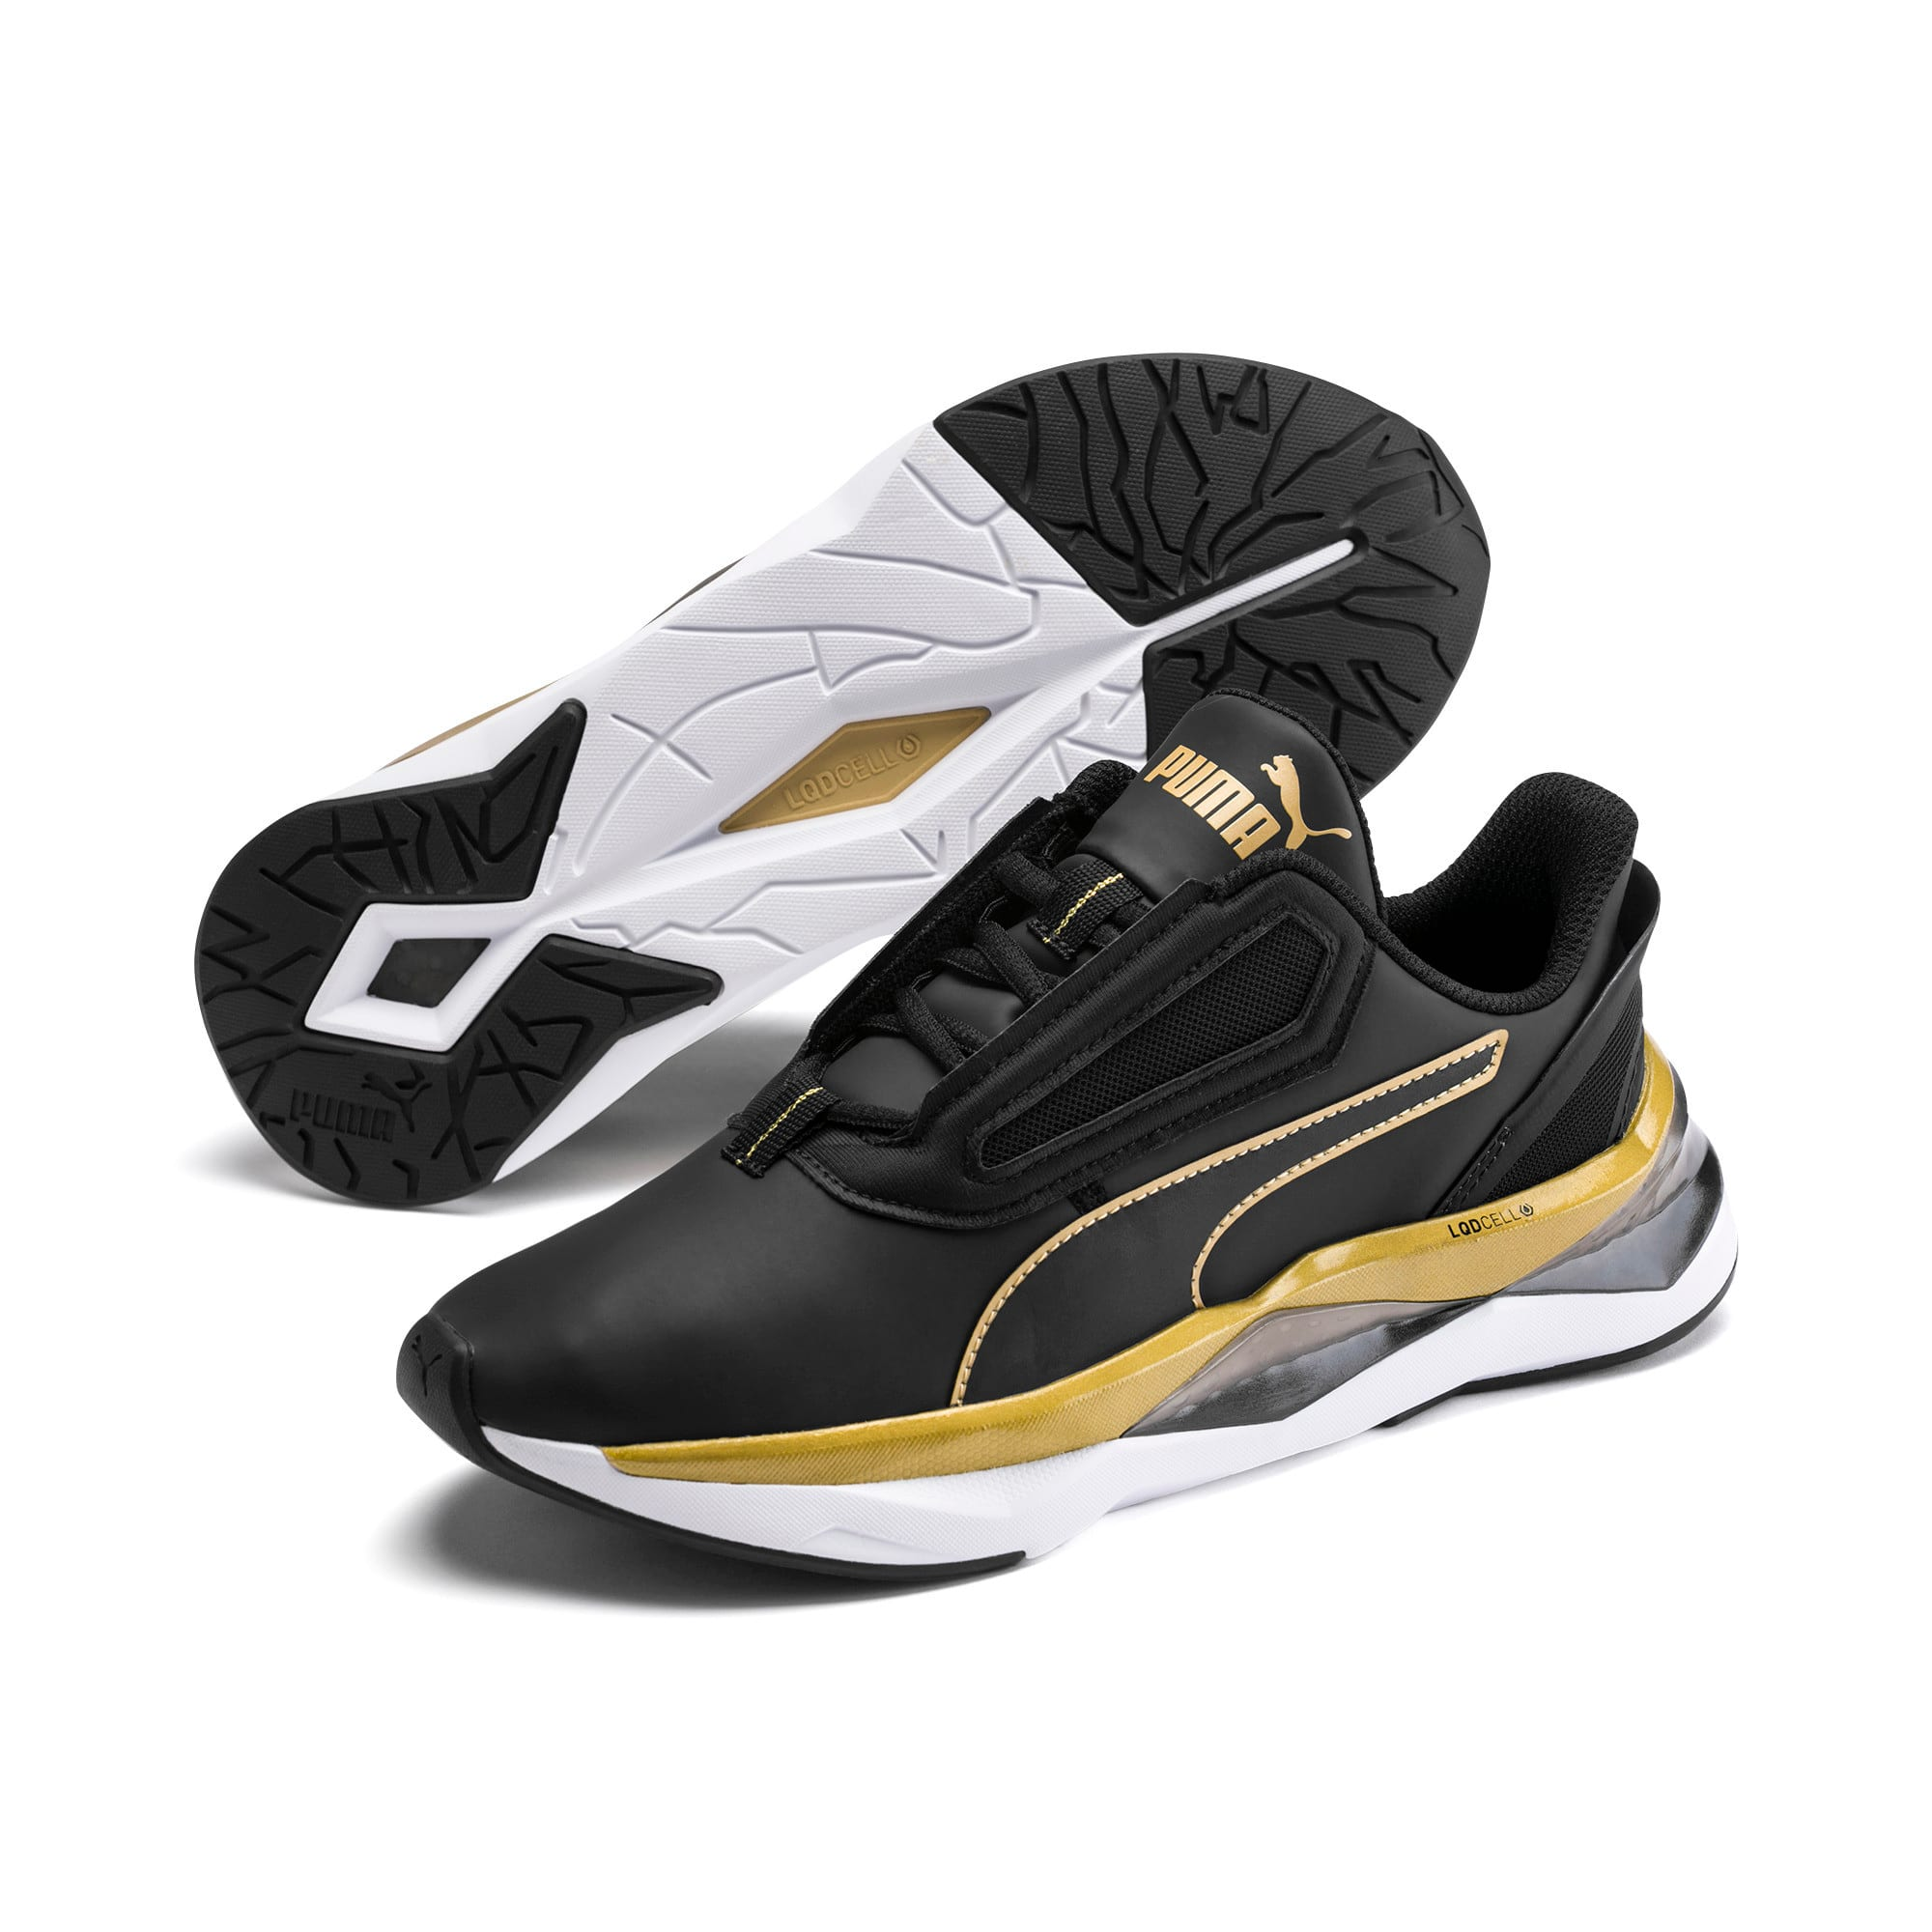 Thumbnail 2 of LQDCELL Shatter XT Matte Women's Training Shoes, Puma Black-Puma Team Gold, medium